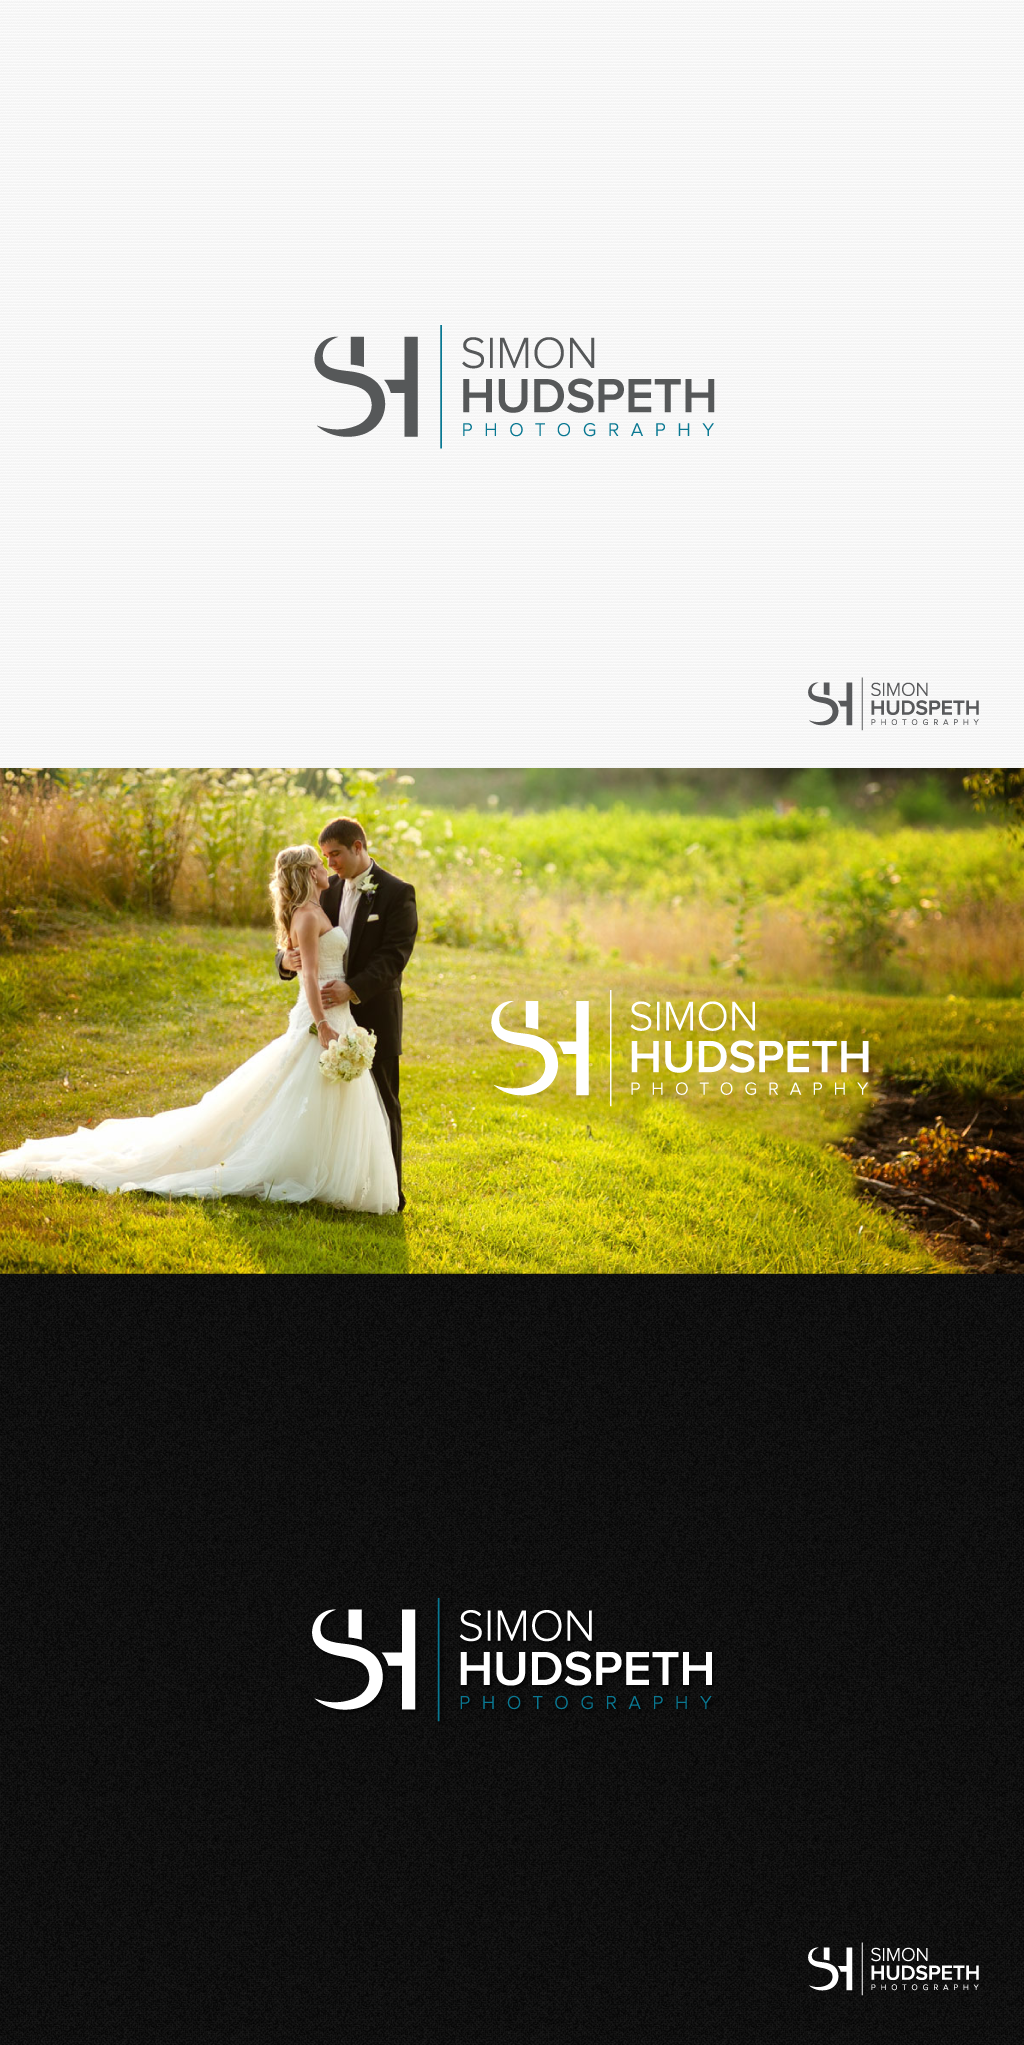 Create a high quality logo for a documentary wedding photographer